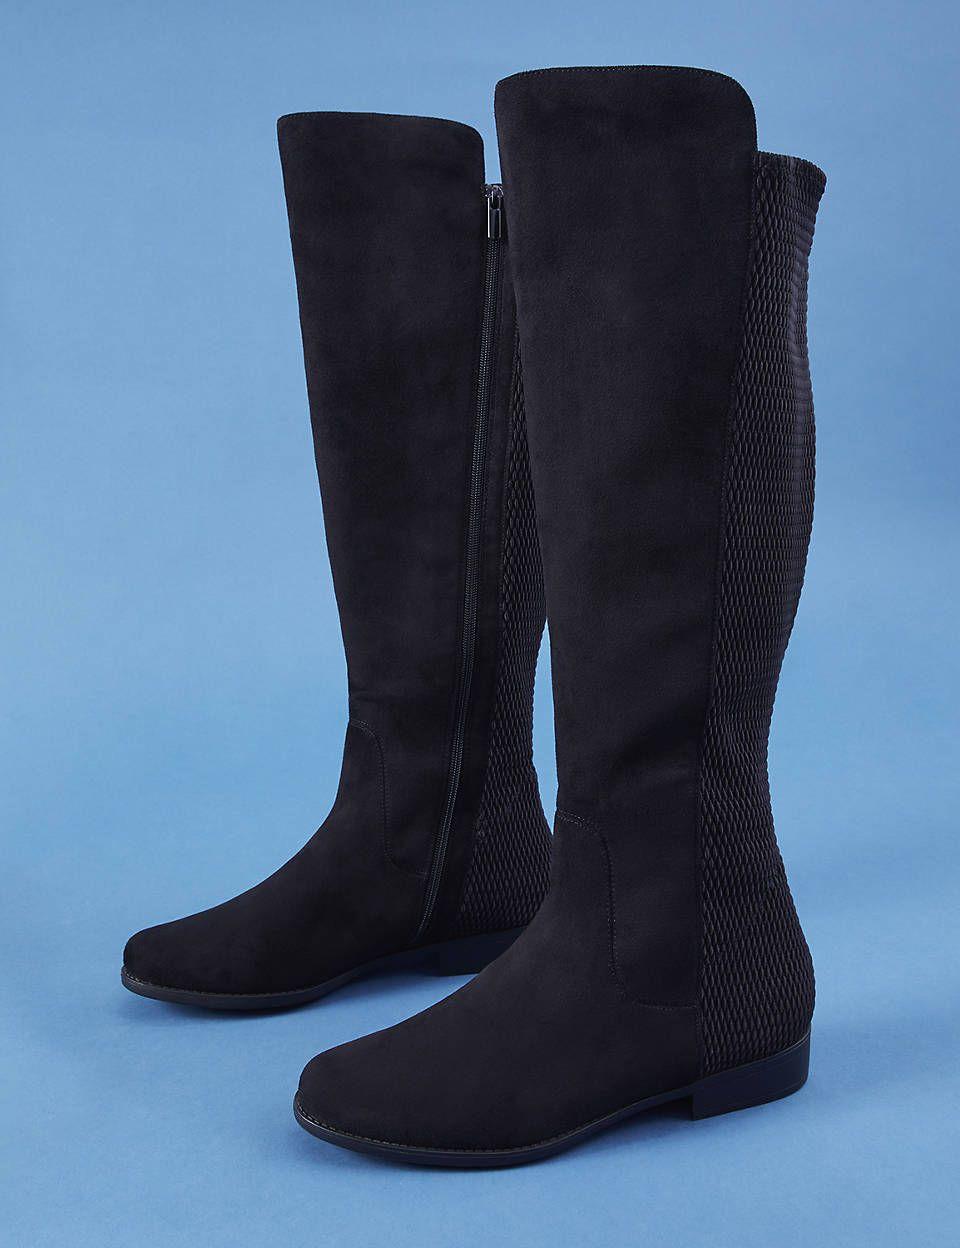 c5ca632833c6 Flat Over-the-Knee Boot